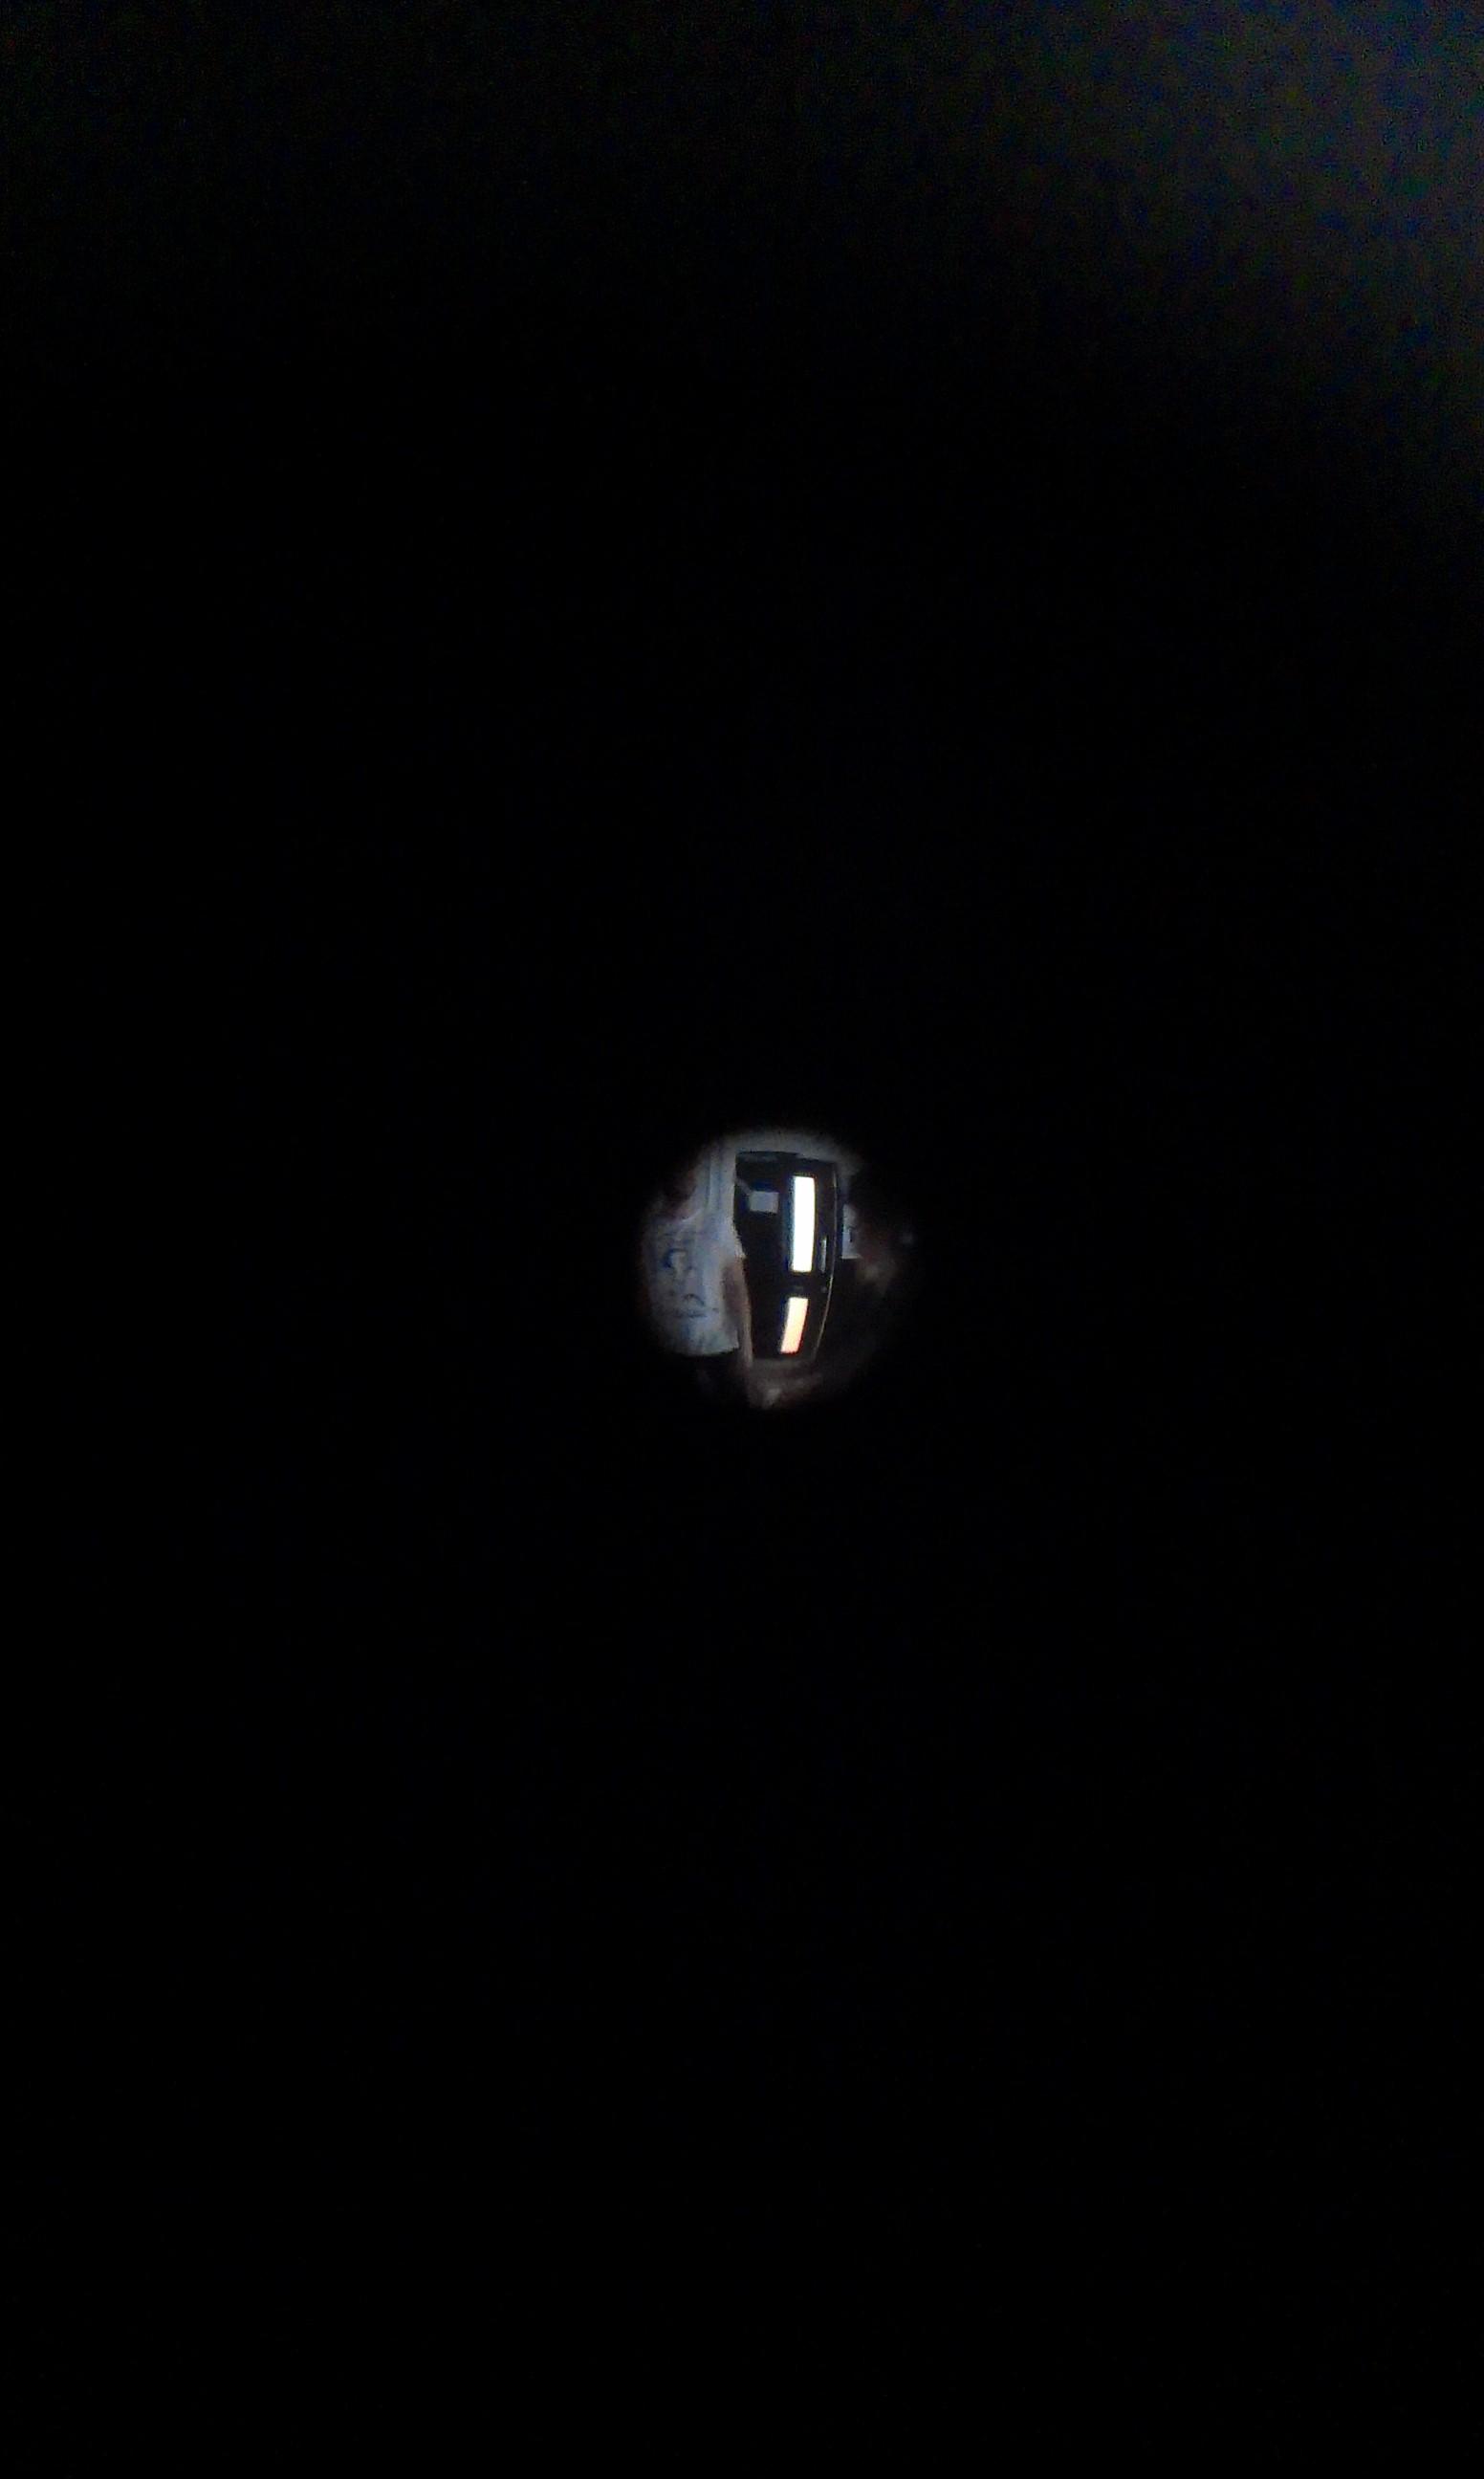 Through the Peephole Photograph 5 (2013)